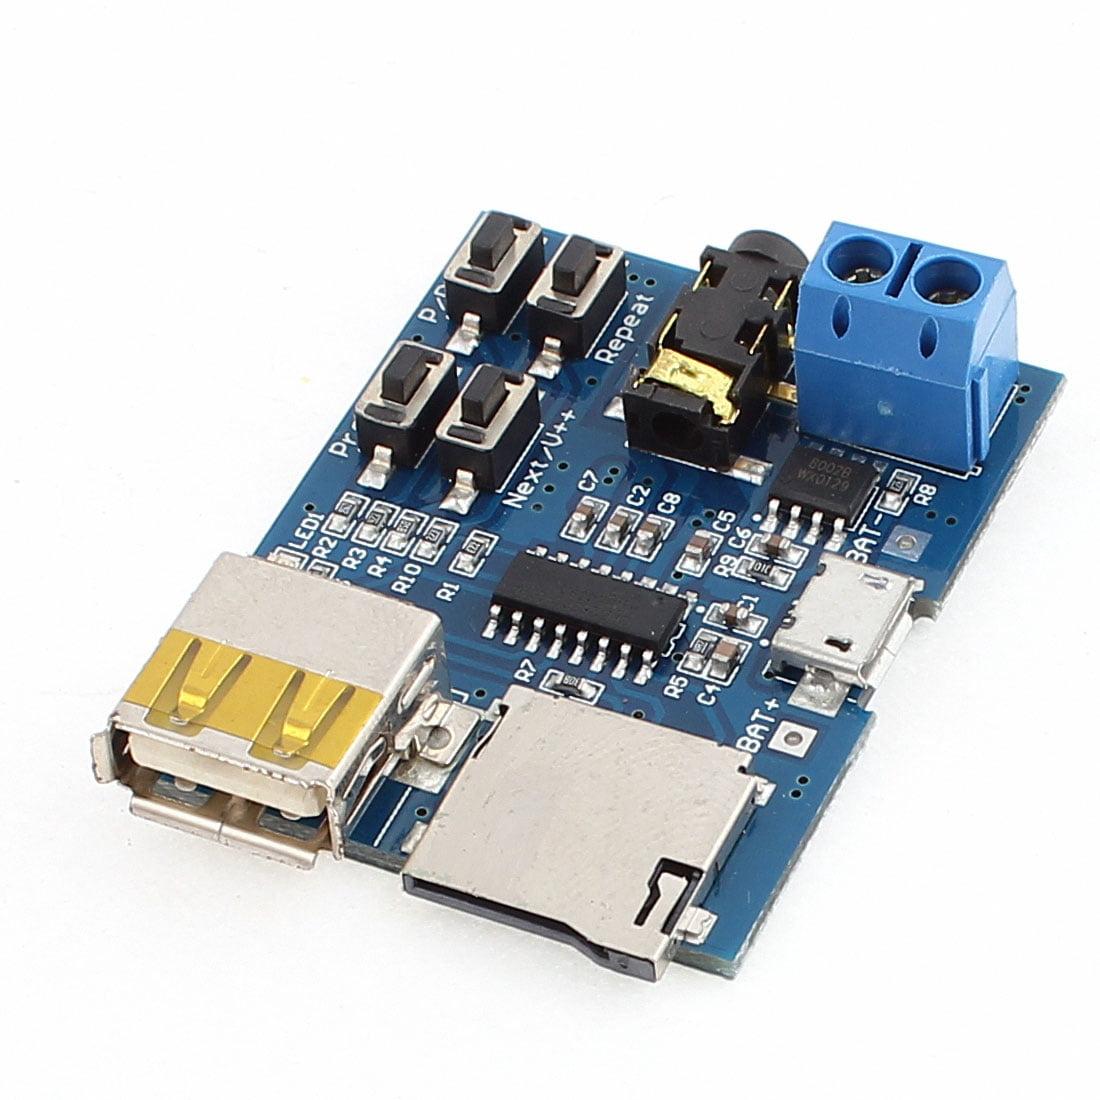 MP3 Free Lossless Audio Decode Module Board with Amplifier USB Female - image 1 de 1